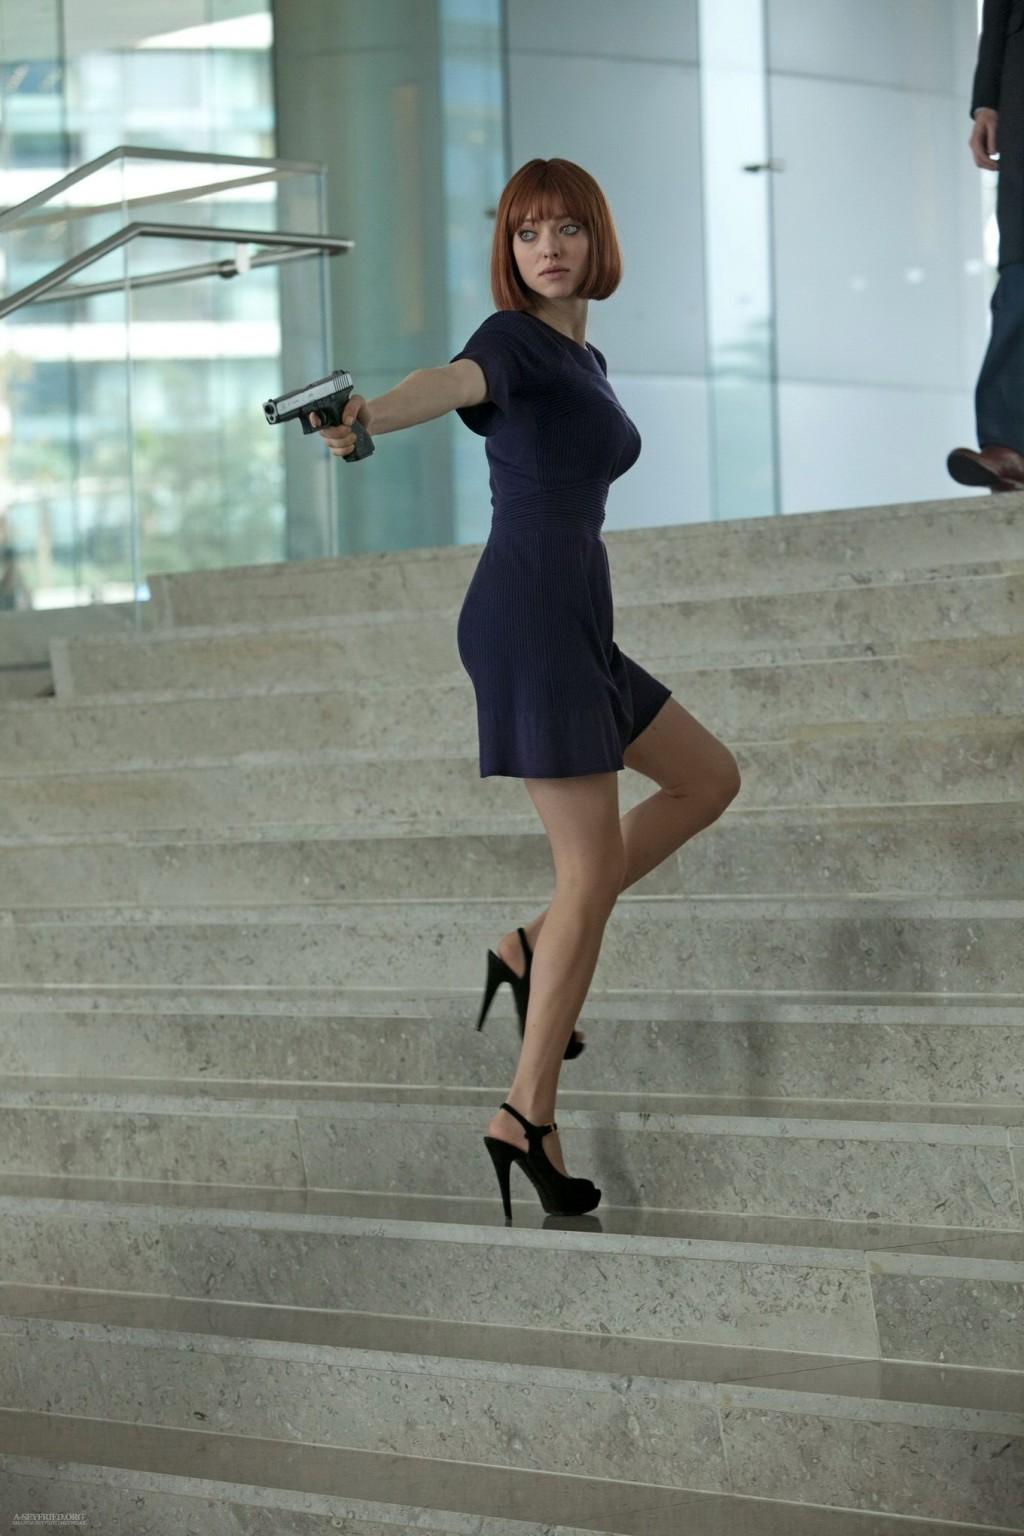 Amanda Seyfried Nude In Time amanda seyfried leggy wearing mini dresses in the 'in time